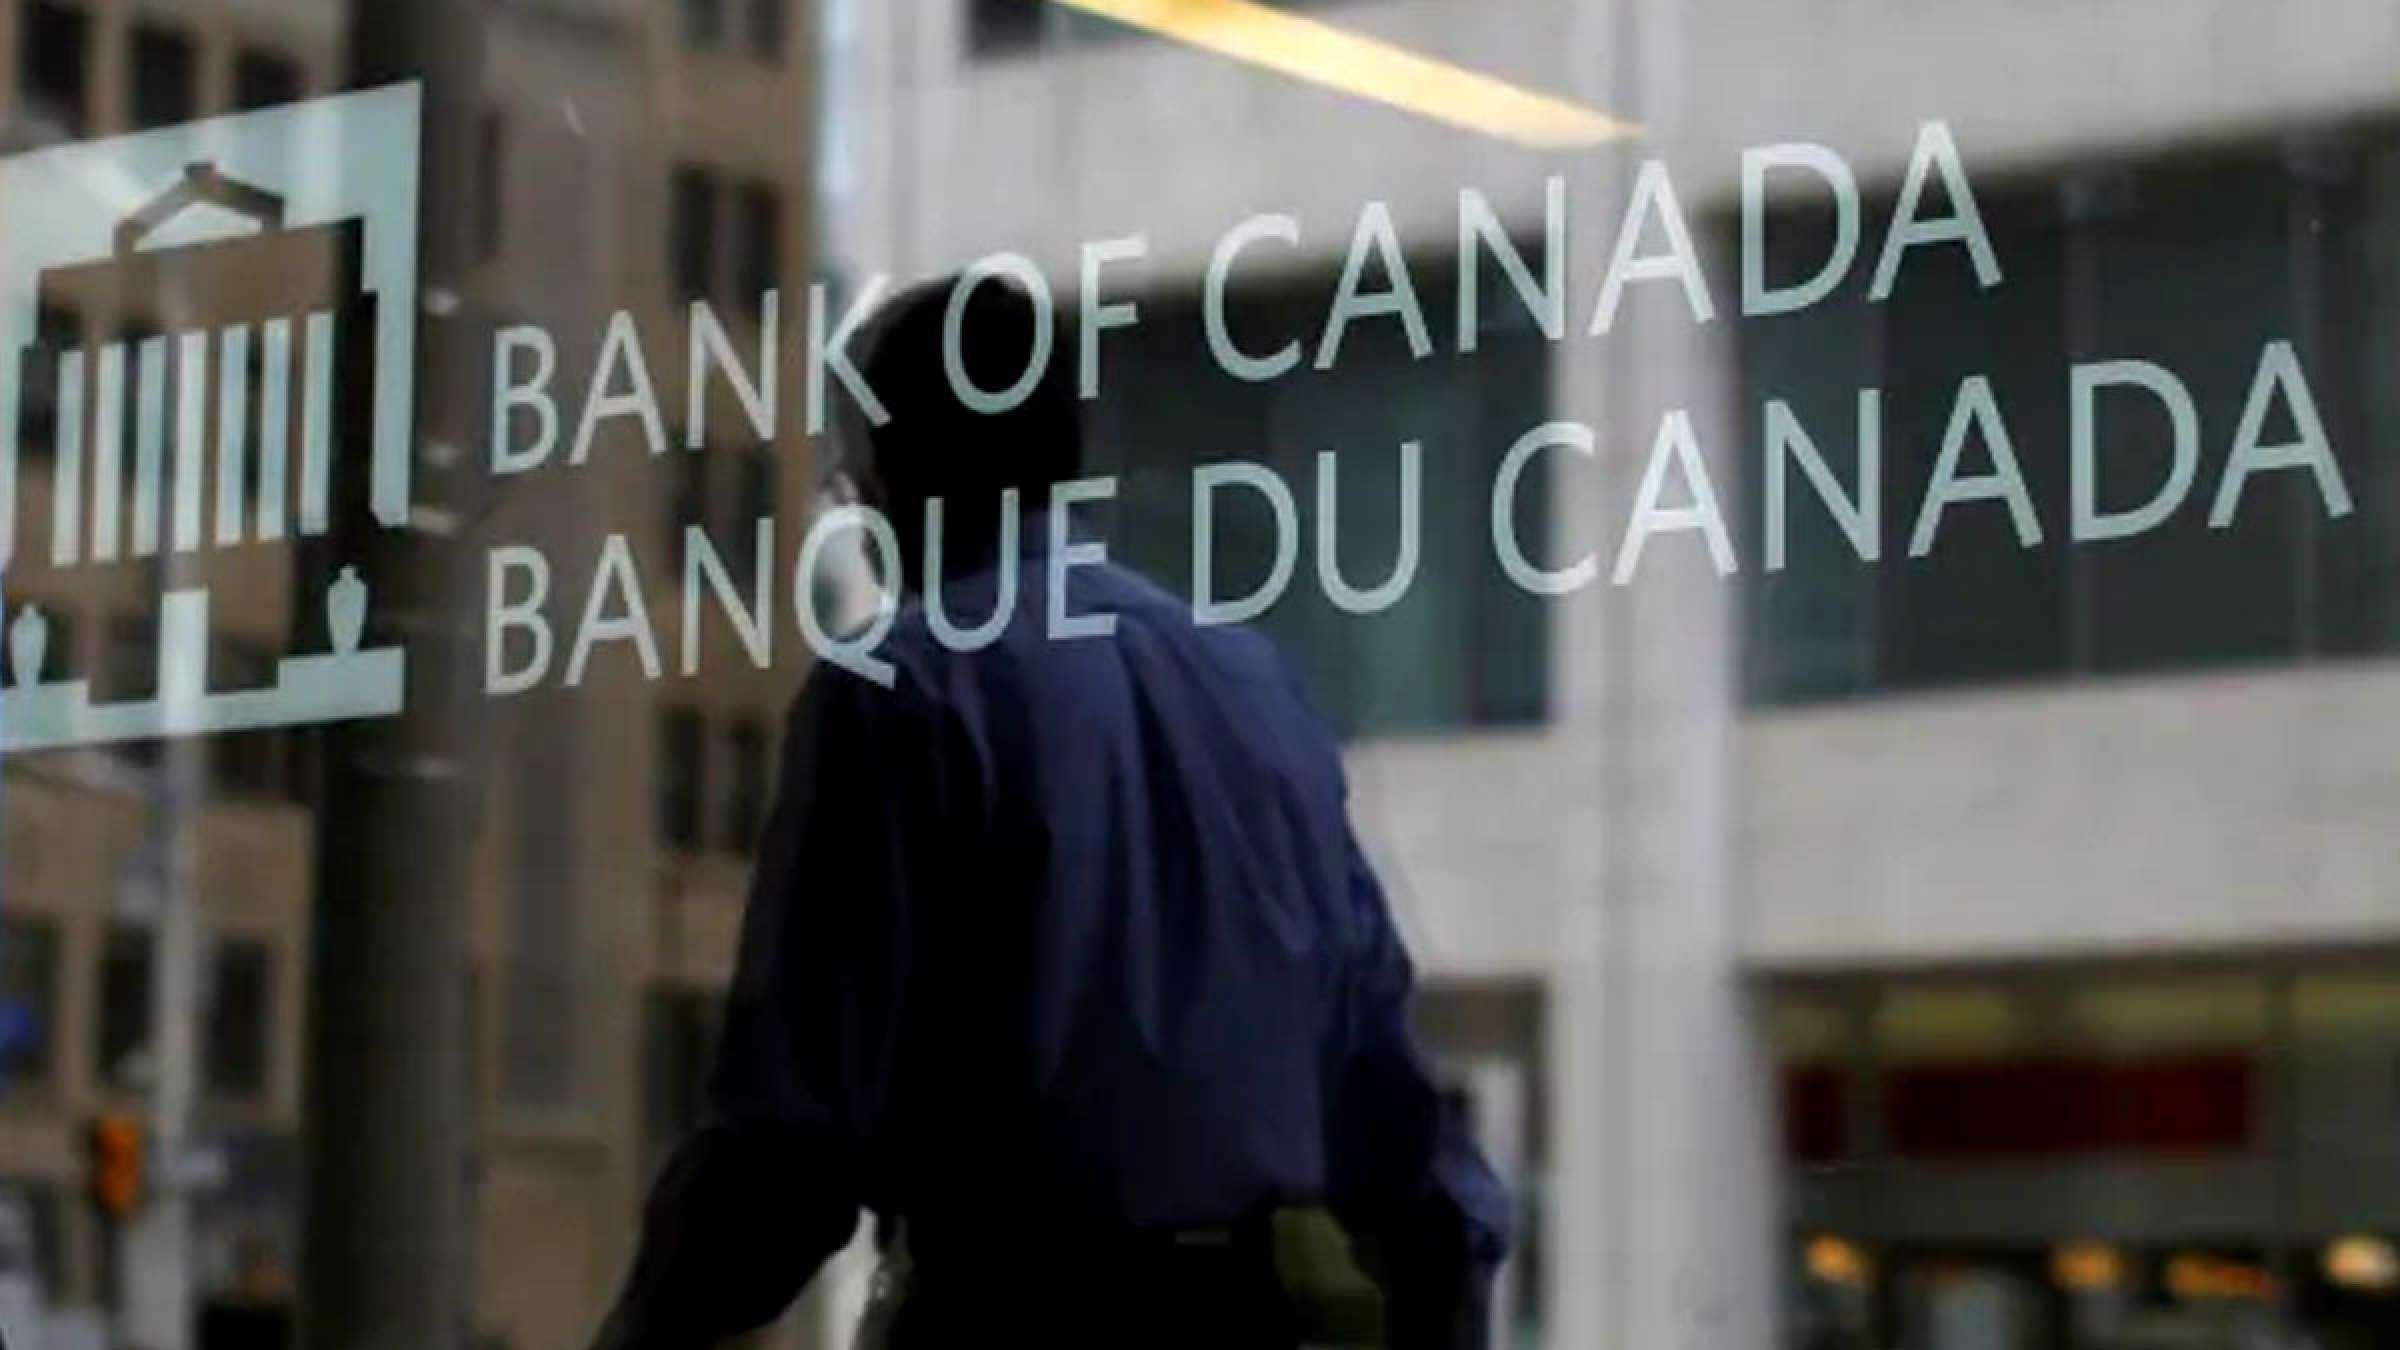 اخبار-کانادا-نرخ-بهره-پایه-کانادا-بازهم-ثابت-ماند